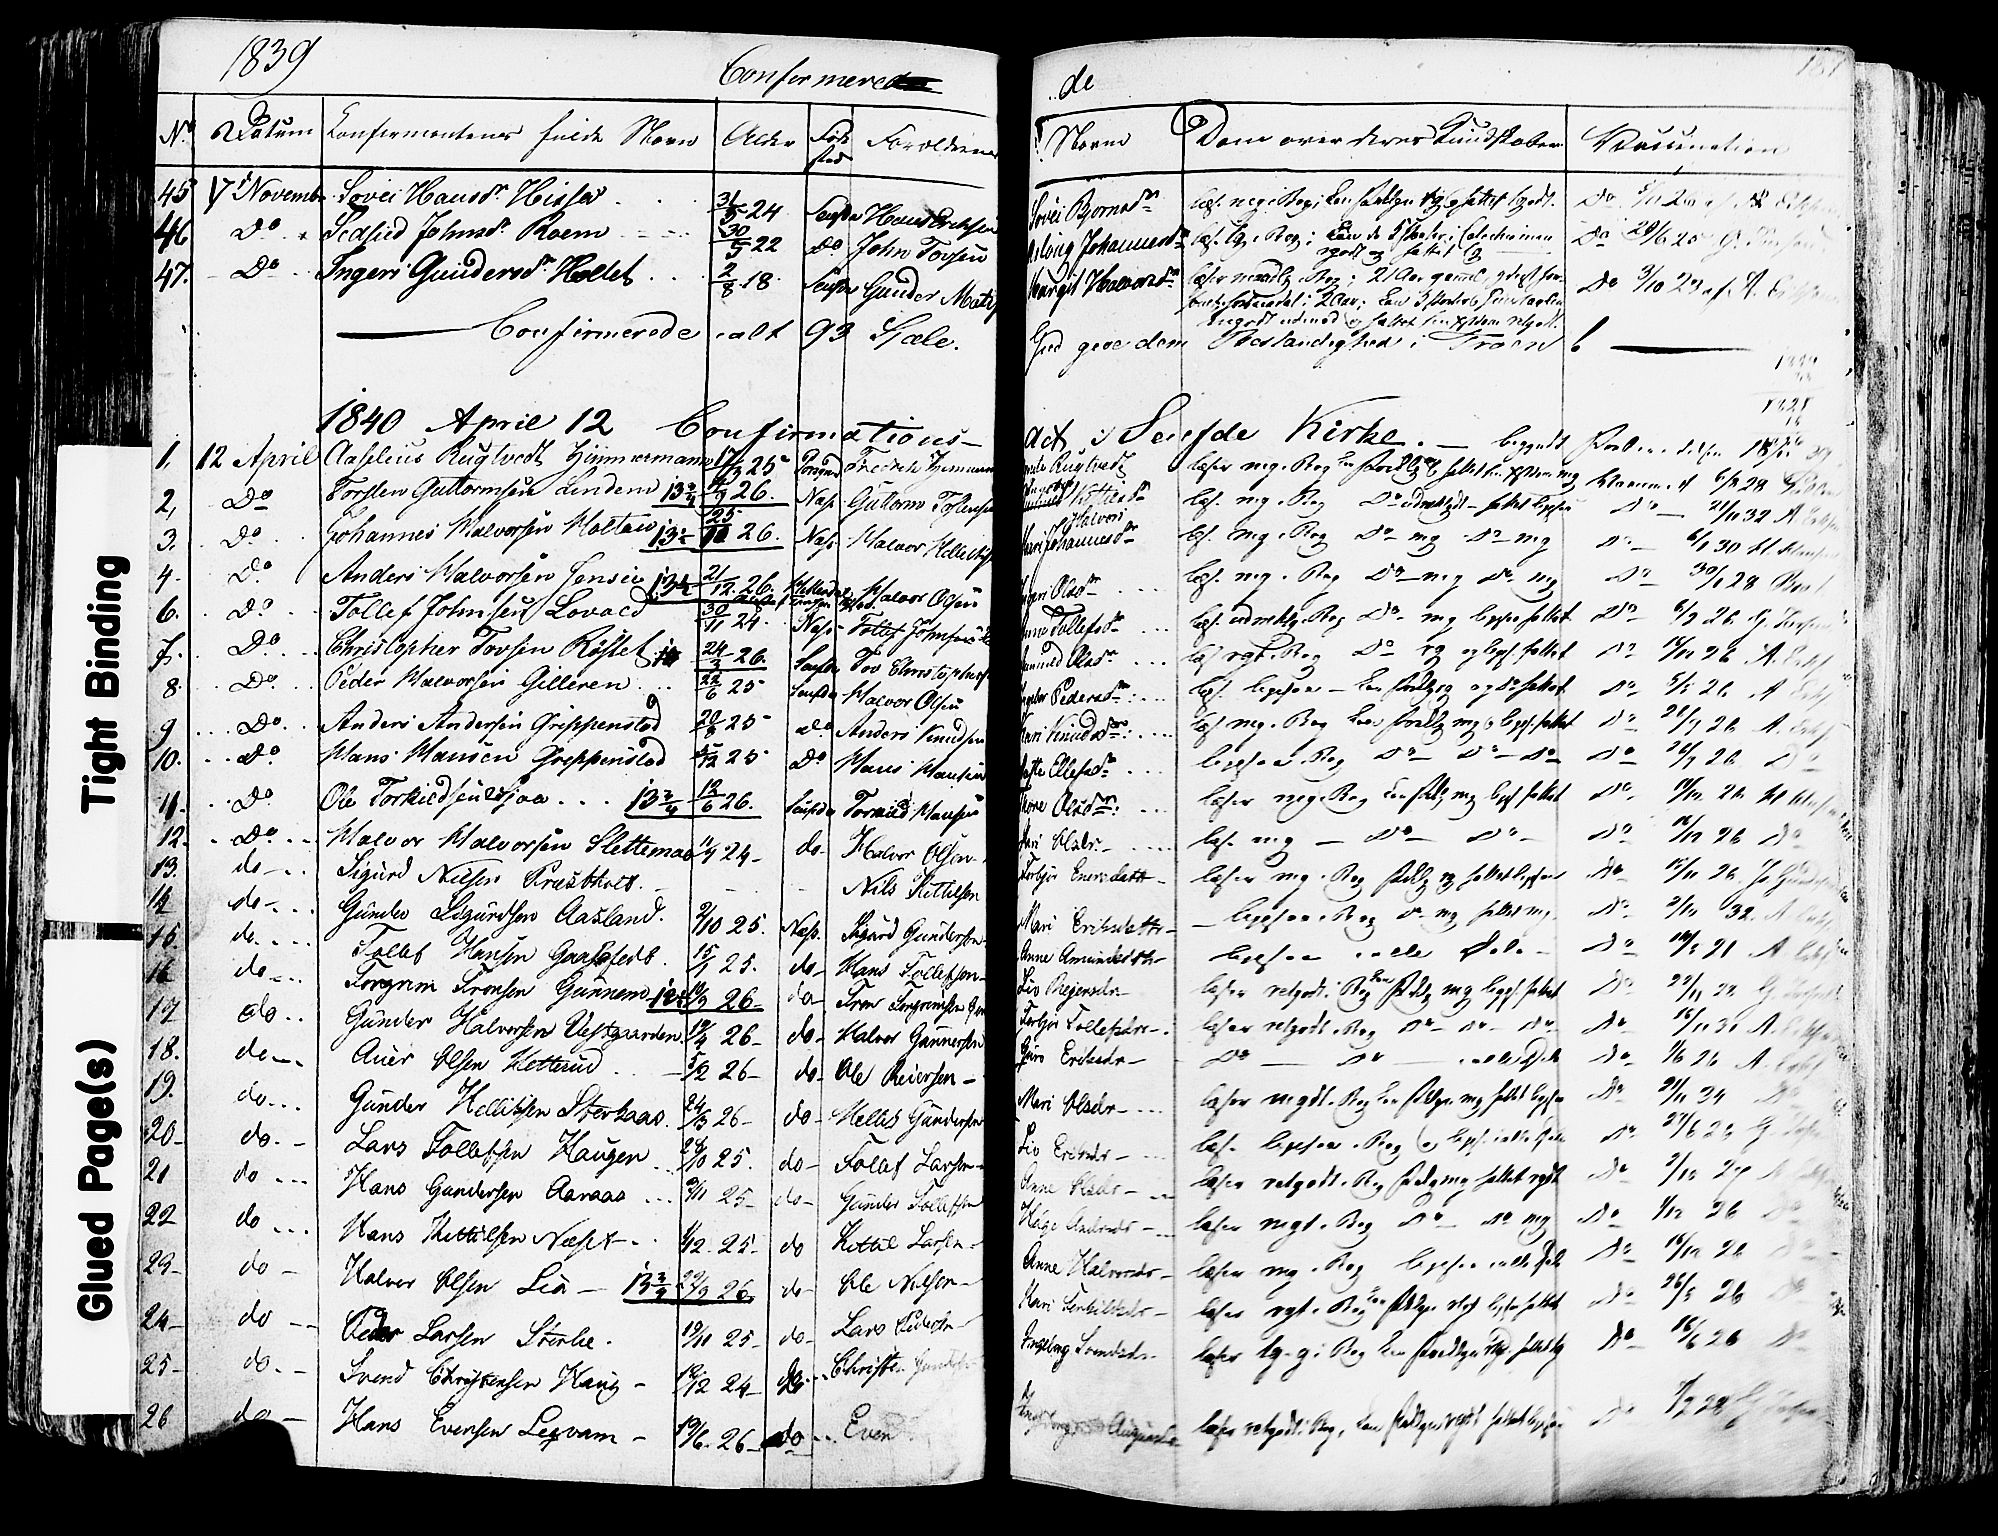 SAKO, Sauherad kirkebøker, F/Fa/L0006: Ministerialbok nr. I 6, 1827-1850, s. 187